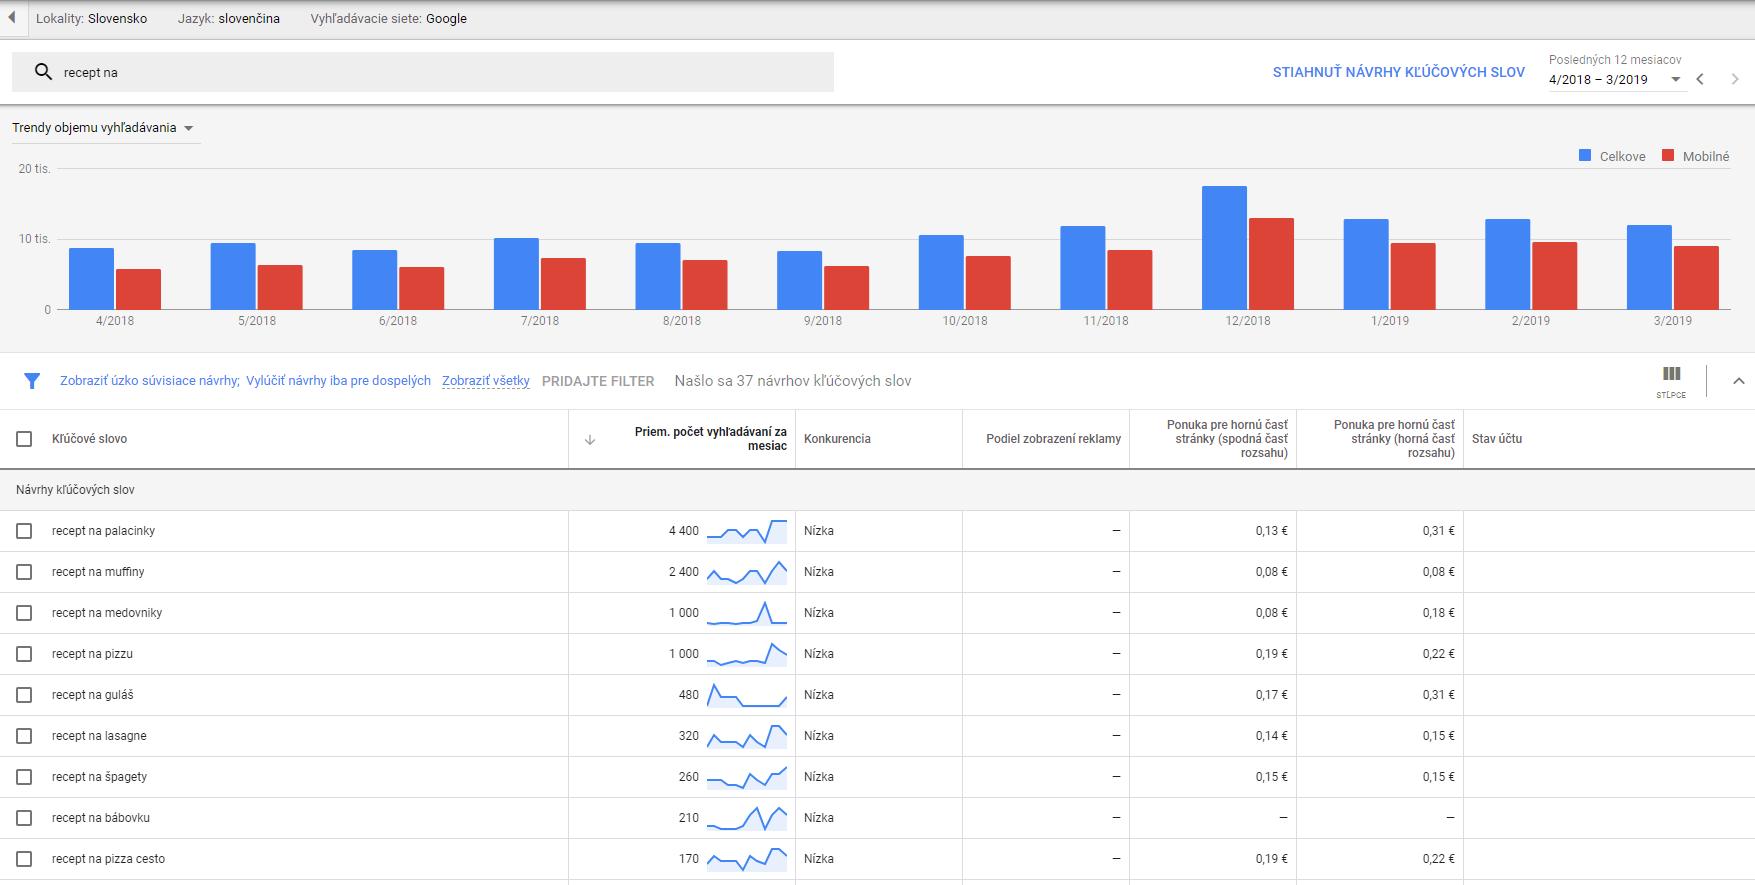 Ukazka-nastroj-google-keywords-planner-ContentFruiter